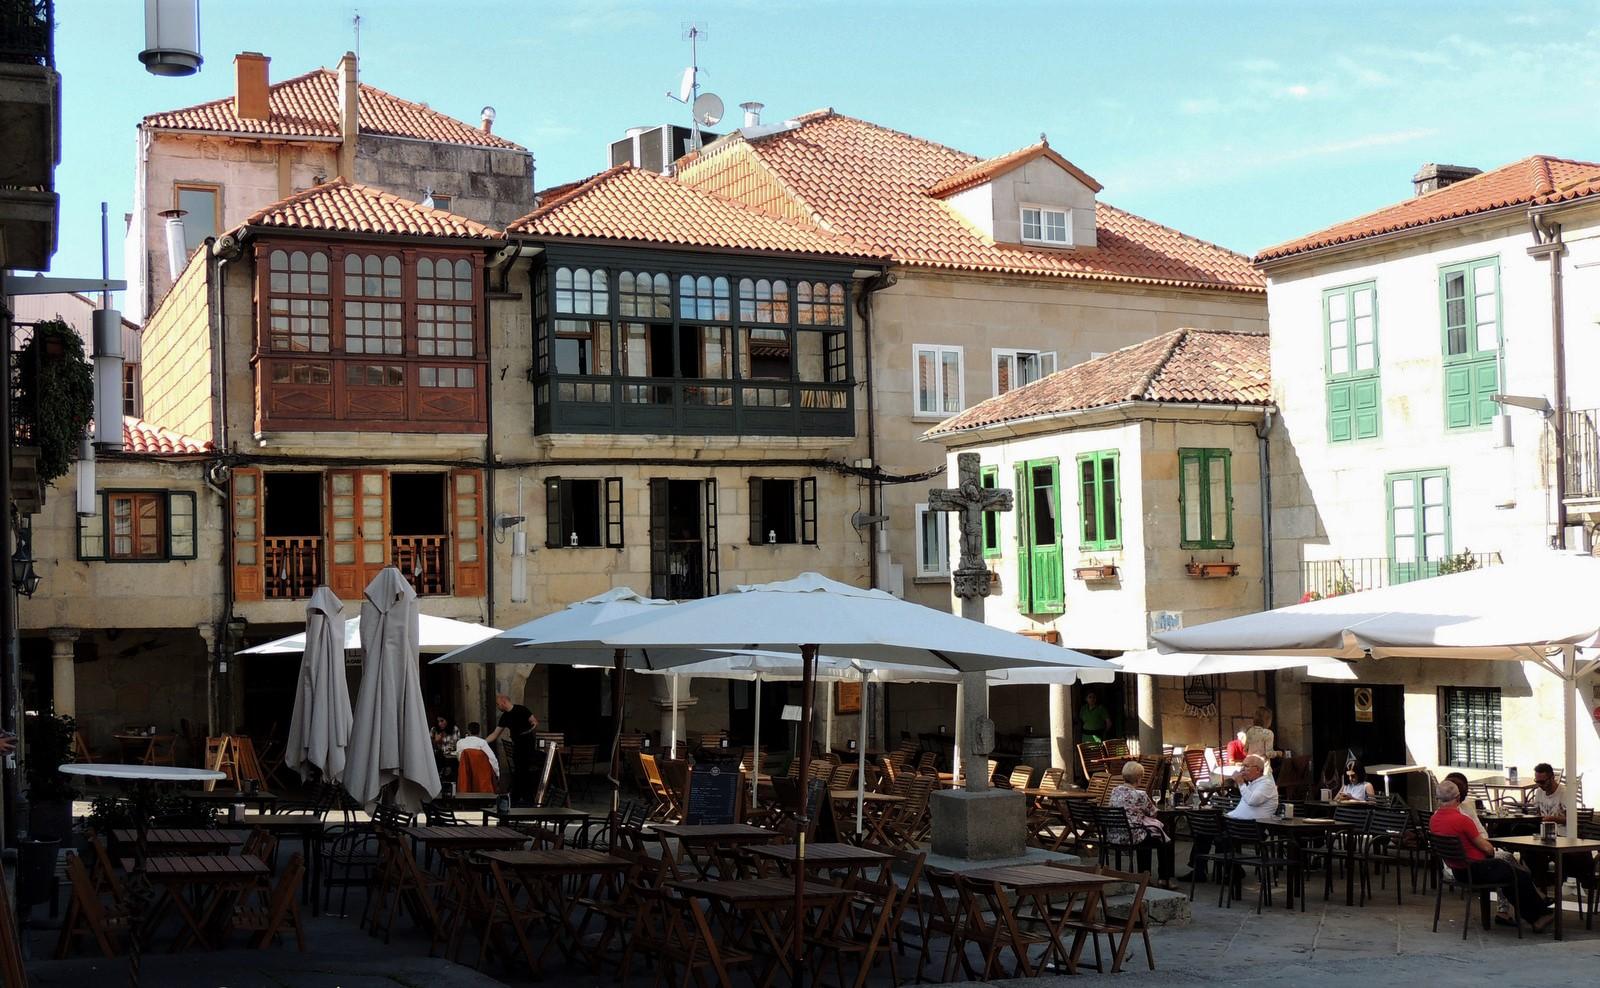 Pontevedra - Praza da Lena